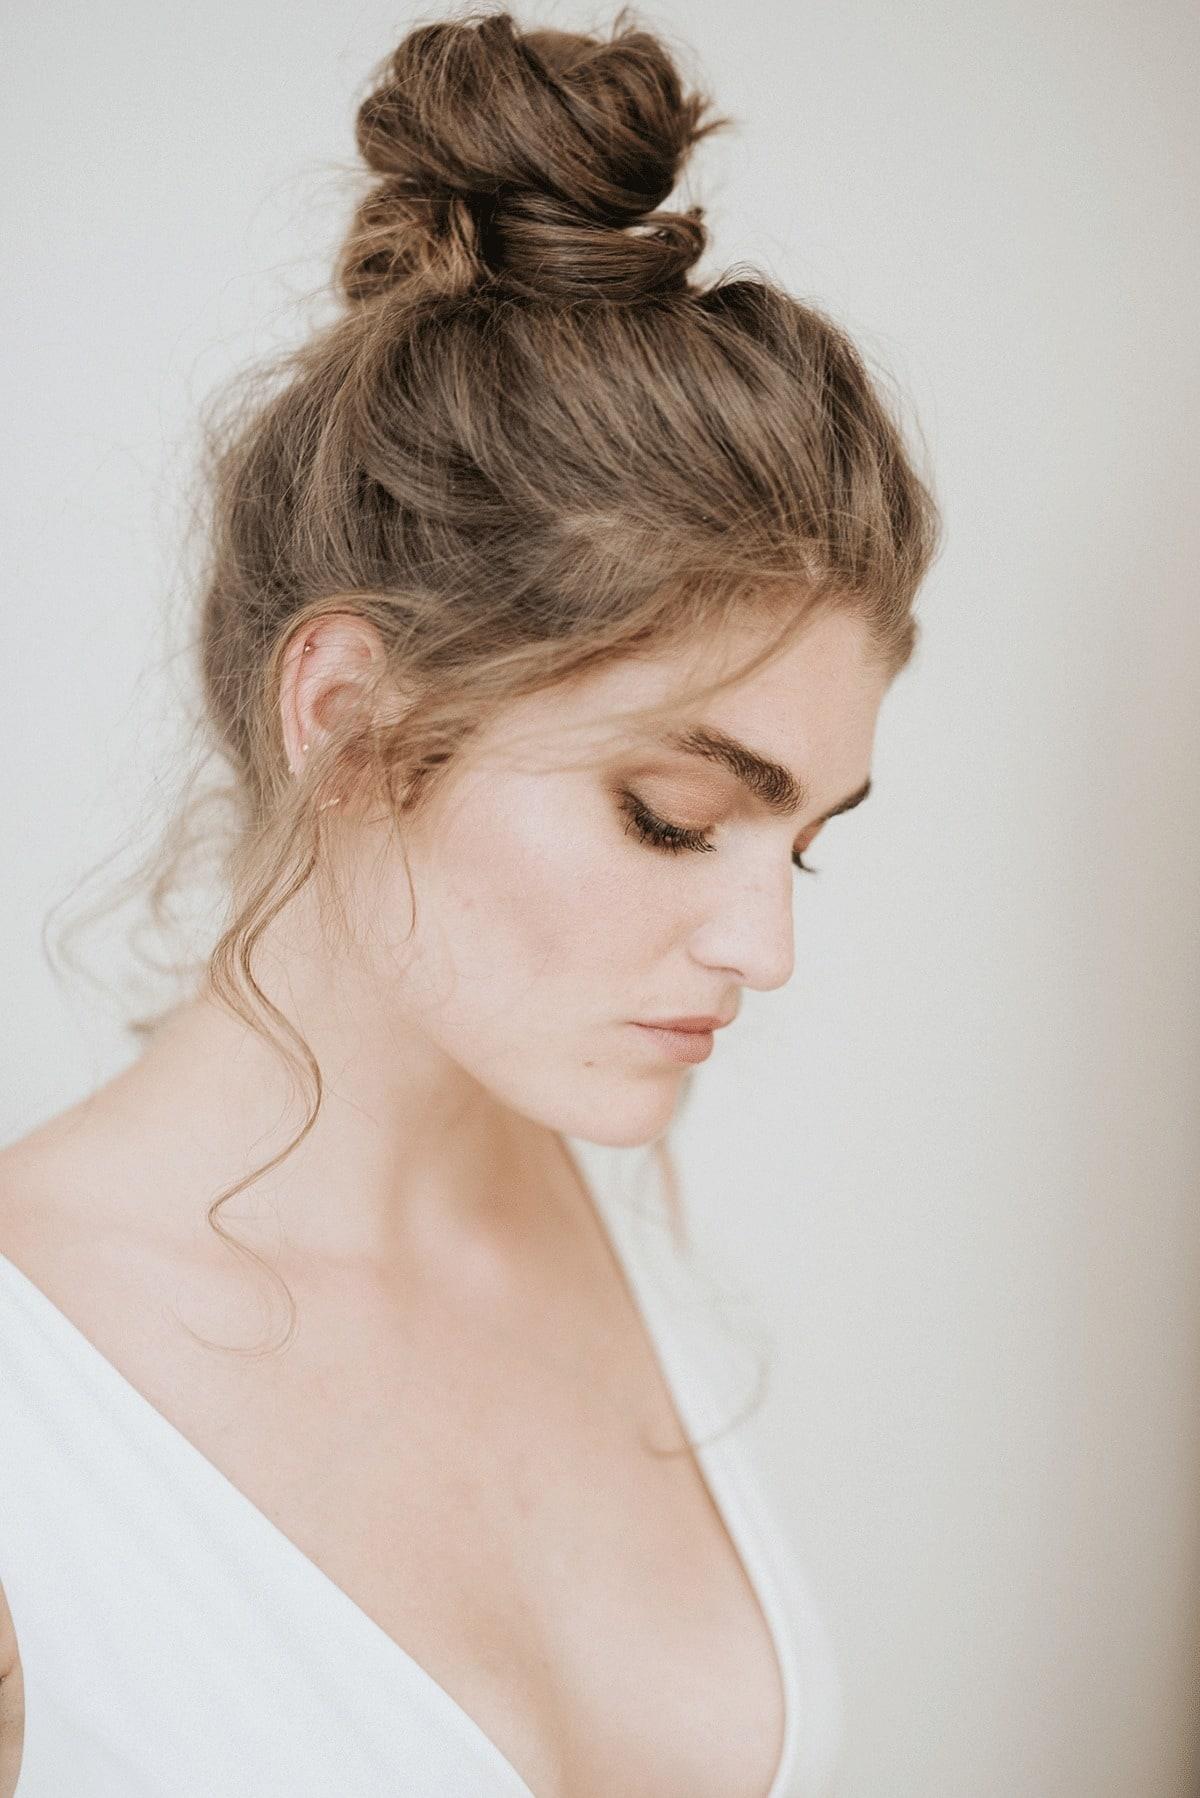 knot-bruidskapsel-bohemian-haar-haarkapsel